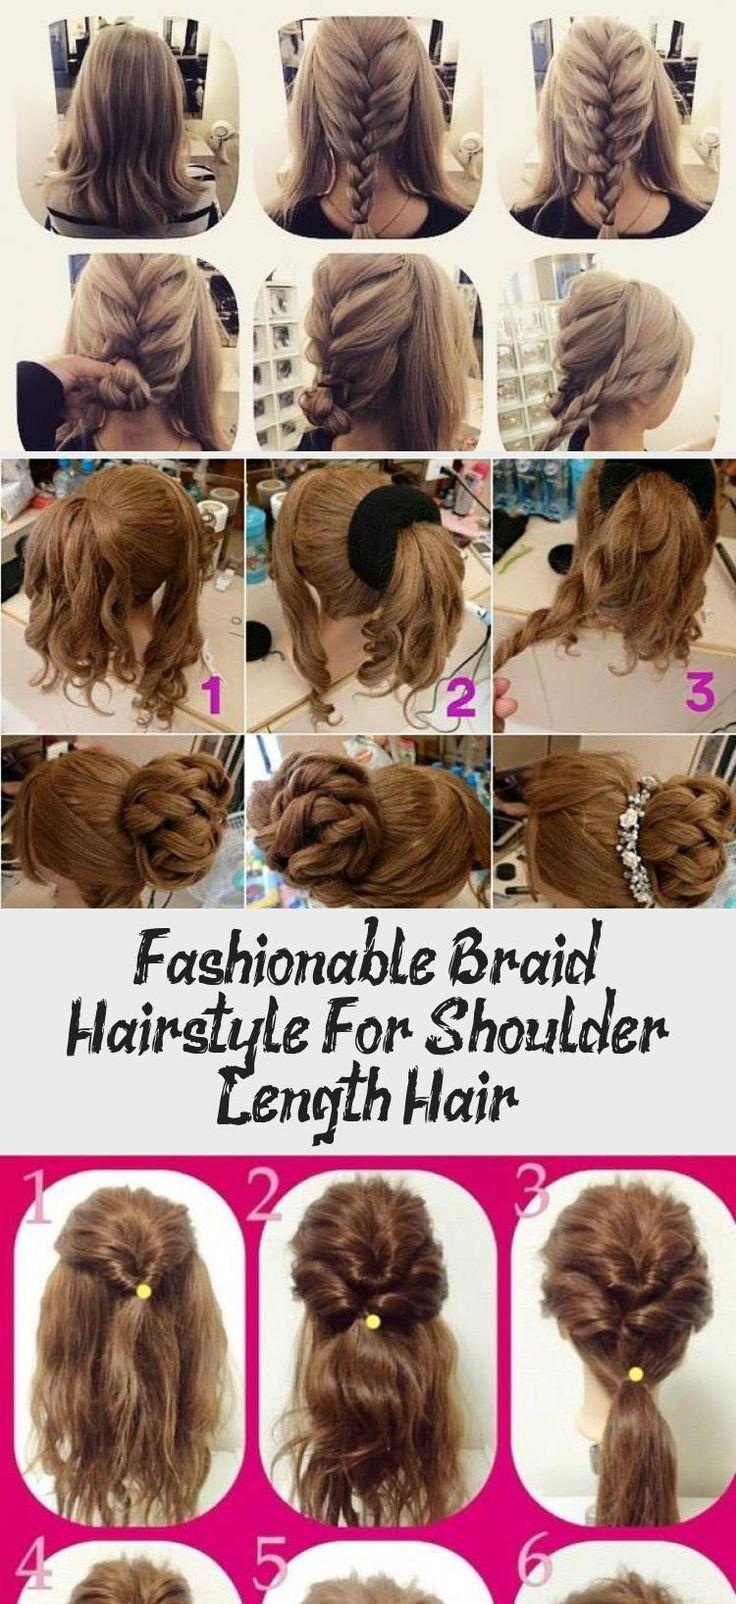 Fashionable Braid Hairstyle For Shoulder Length Hair Hairtutorialpeinados Hairtutorialtiktok Hairtutori In 2020 Shoulder Length Hair Hair Lengths Braided Hairstyles